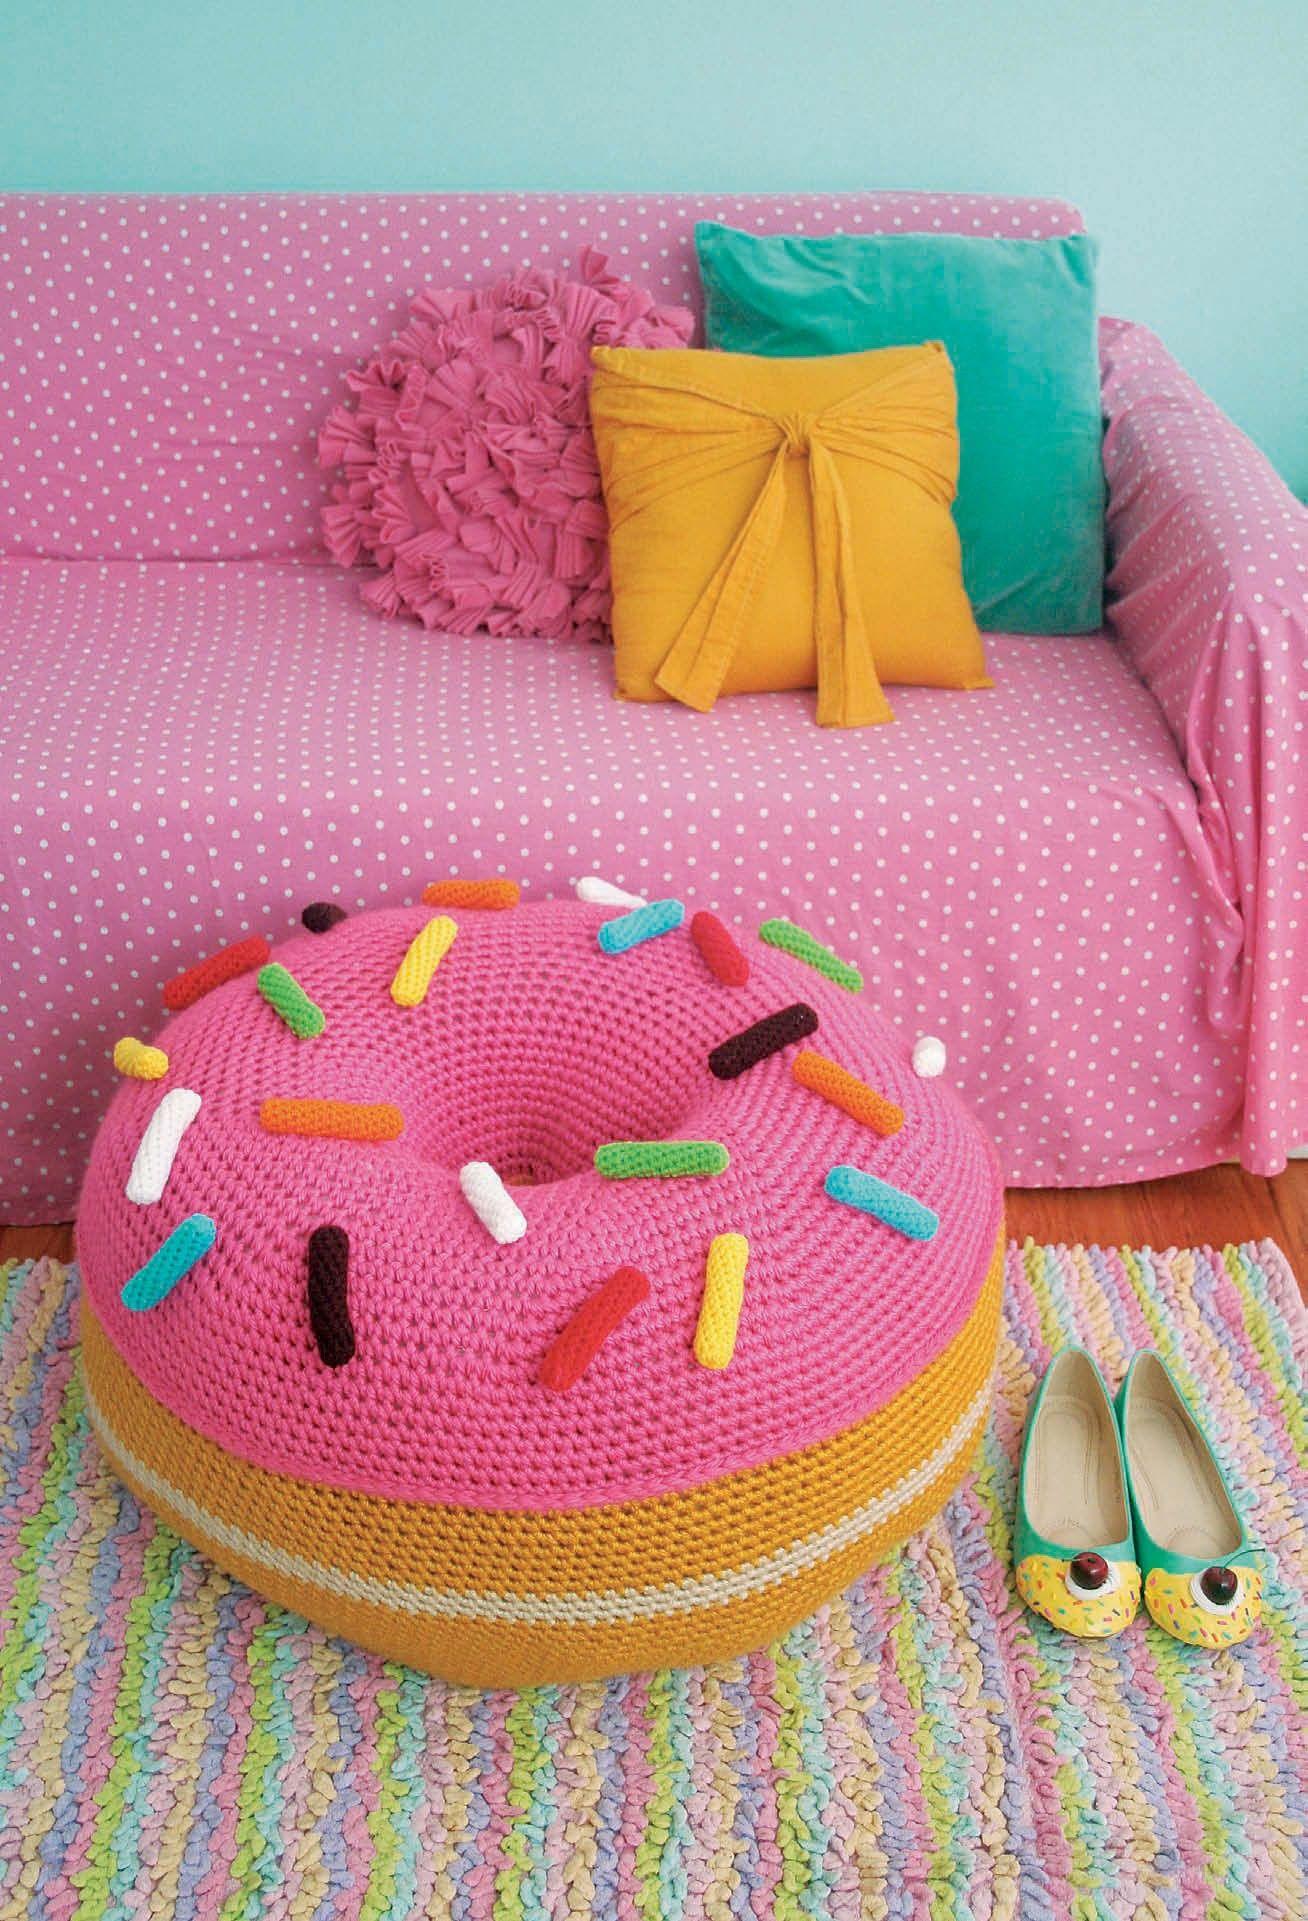 Giant Donut Floor Pouf (Crochet) - Lion Brand Yarn | crochet ...